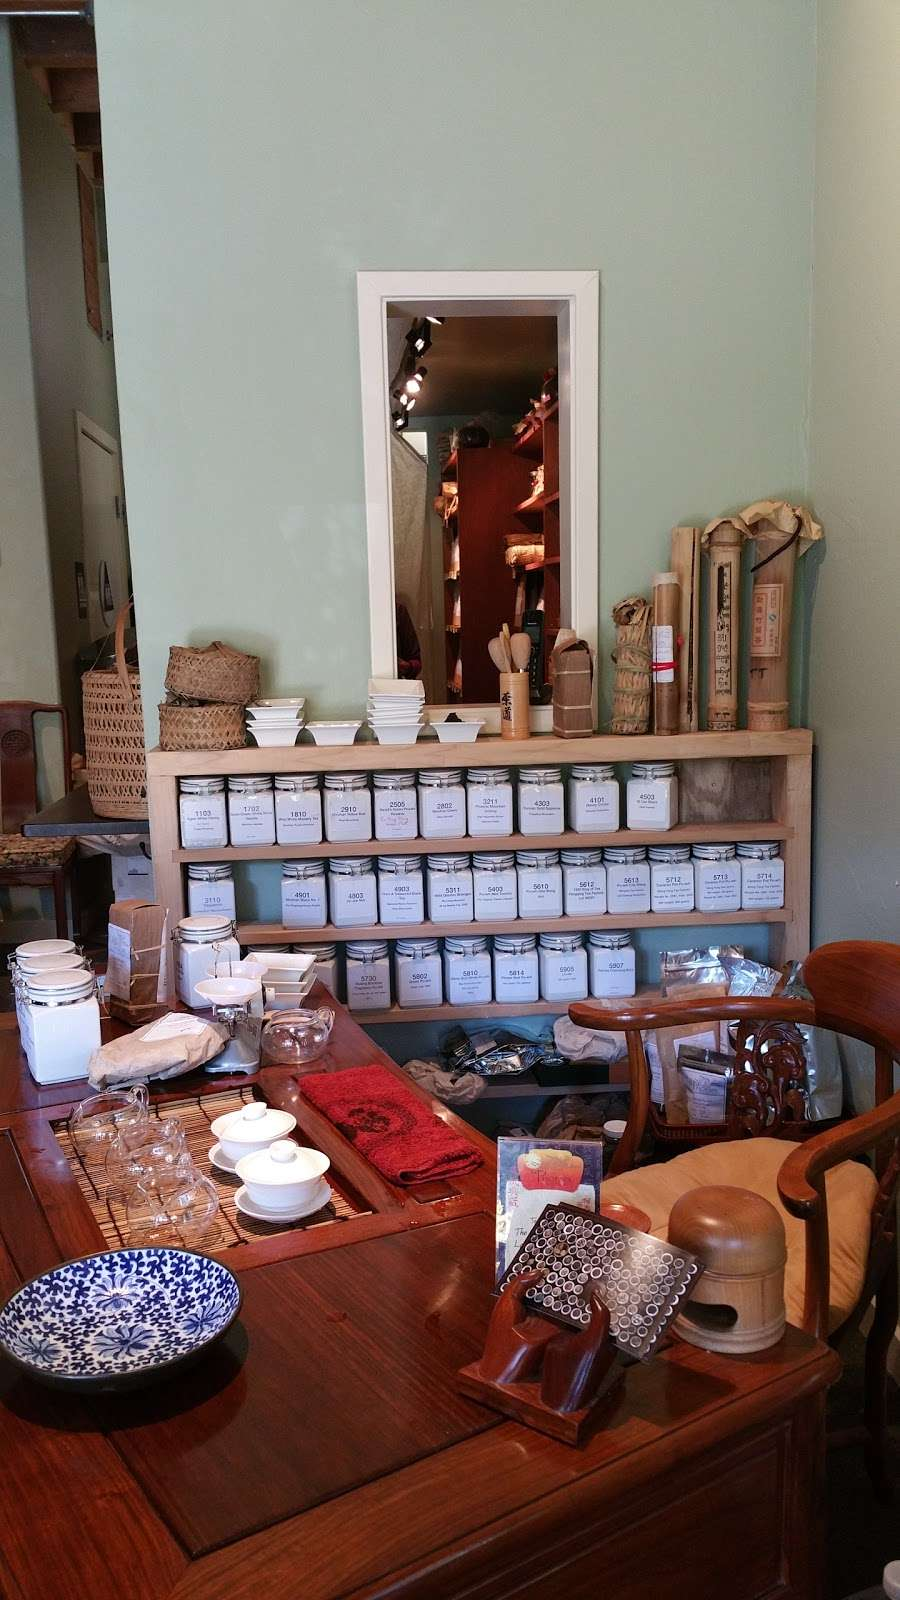 Tea Museum & The Phoenix Collection - museum  | Photo 10 of 10 | Address: 7282 Sir Francis Drake Blvd, Lagunitas, CA 94938, USA | Phone: (415) 488-9017